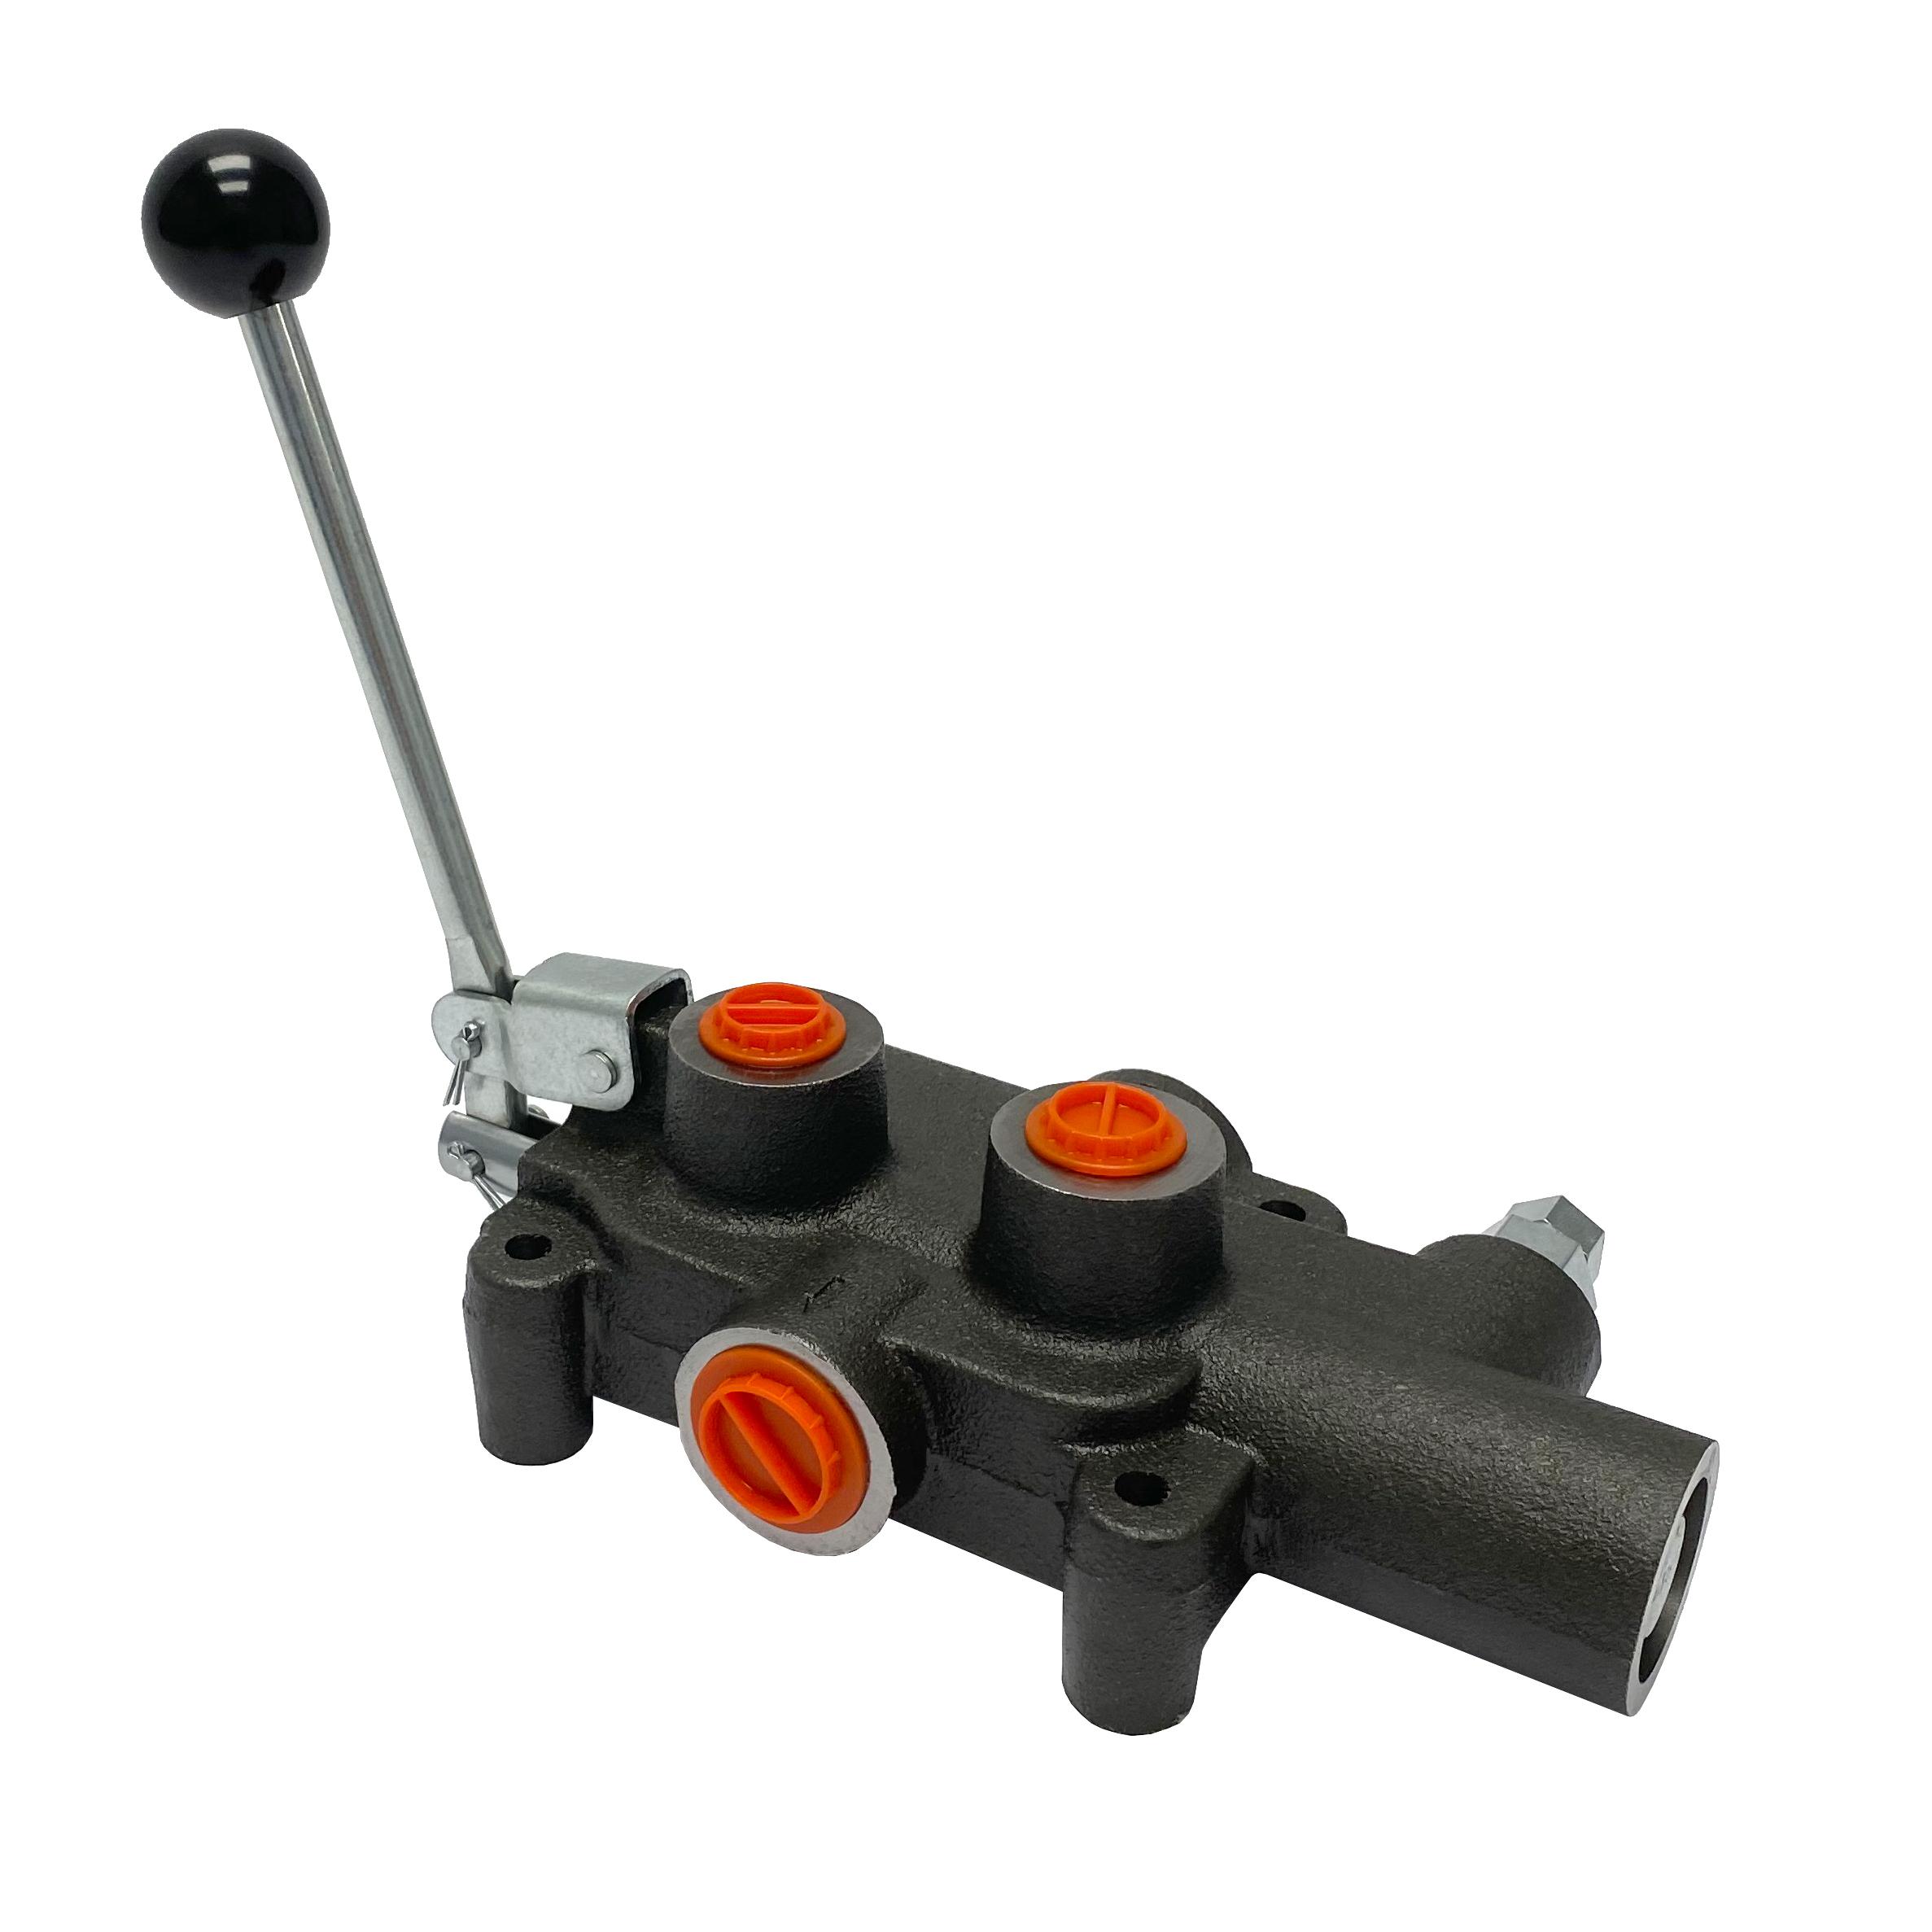 1 spool x 21 GPM hydraulic log splitter high speed control valve, monoblock cast iron valve   Magister Hydraulics